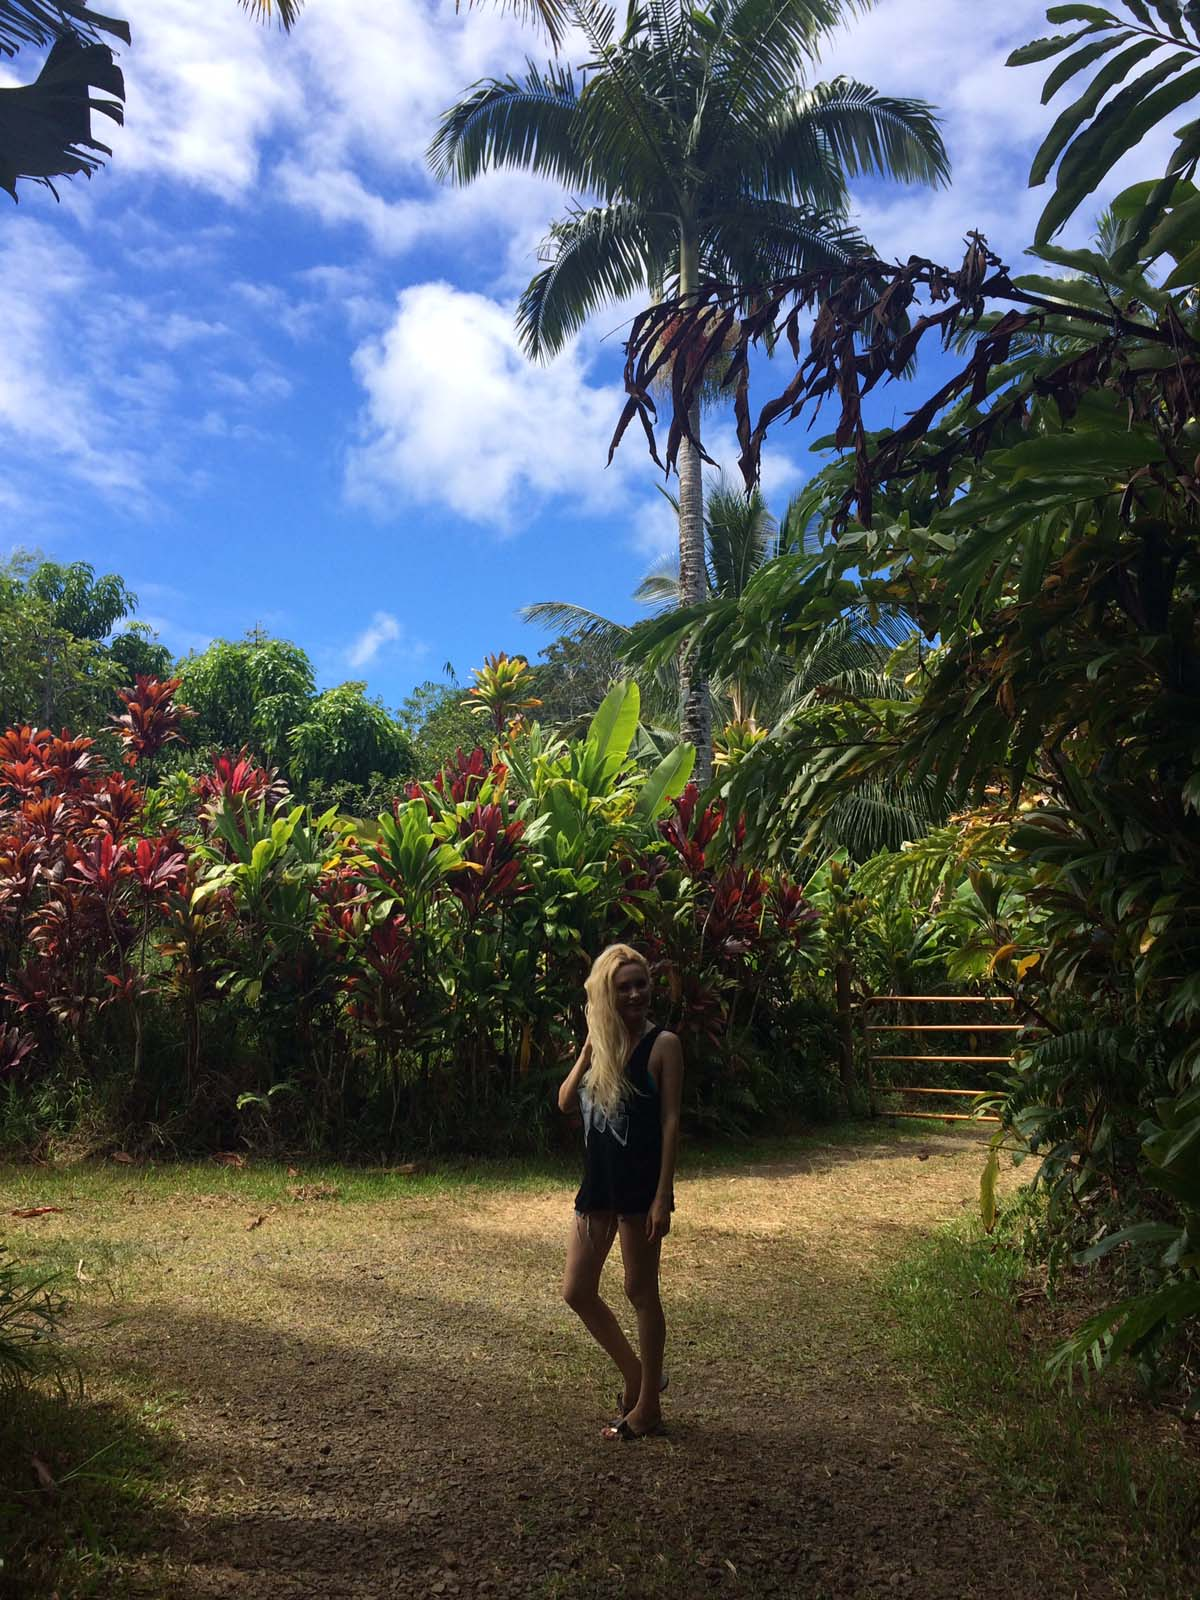 024_maui_hawaii_island